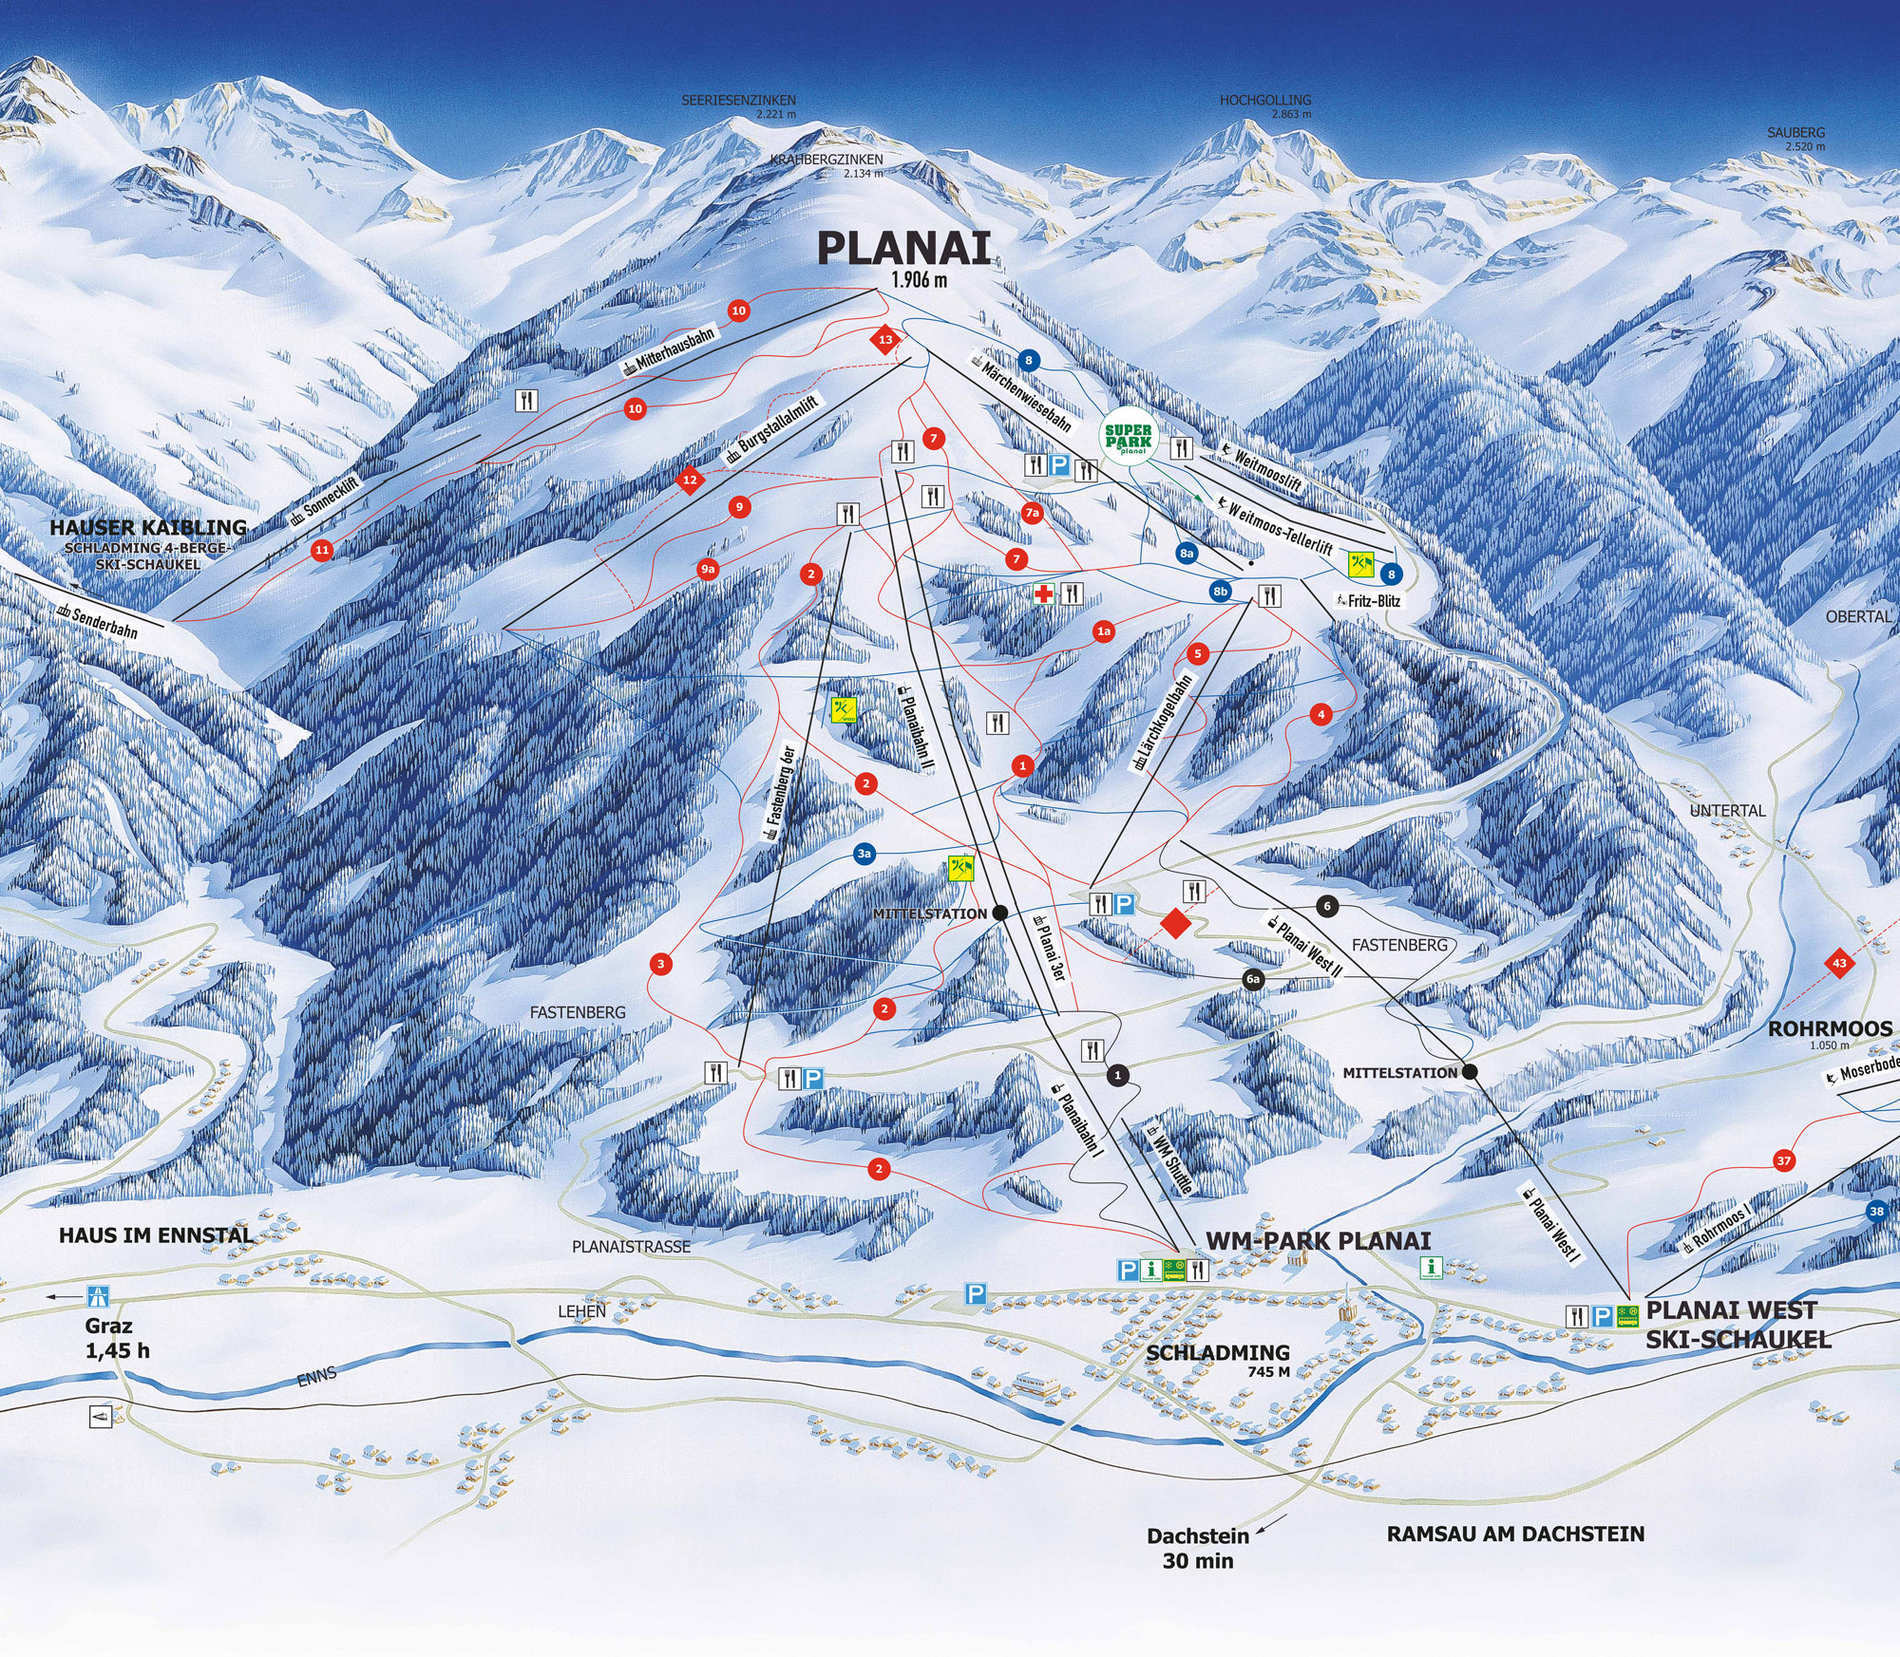 planai map snowpark website